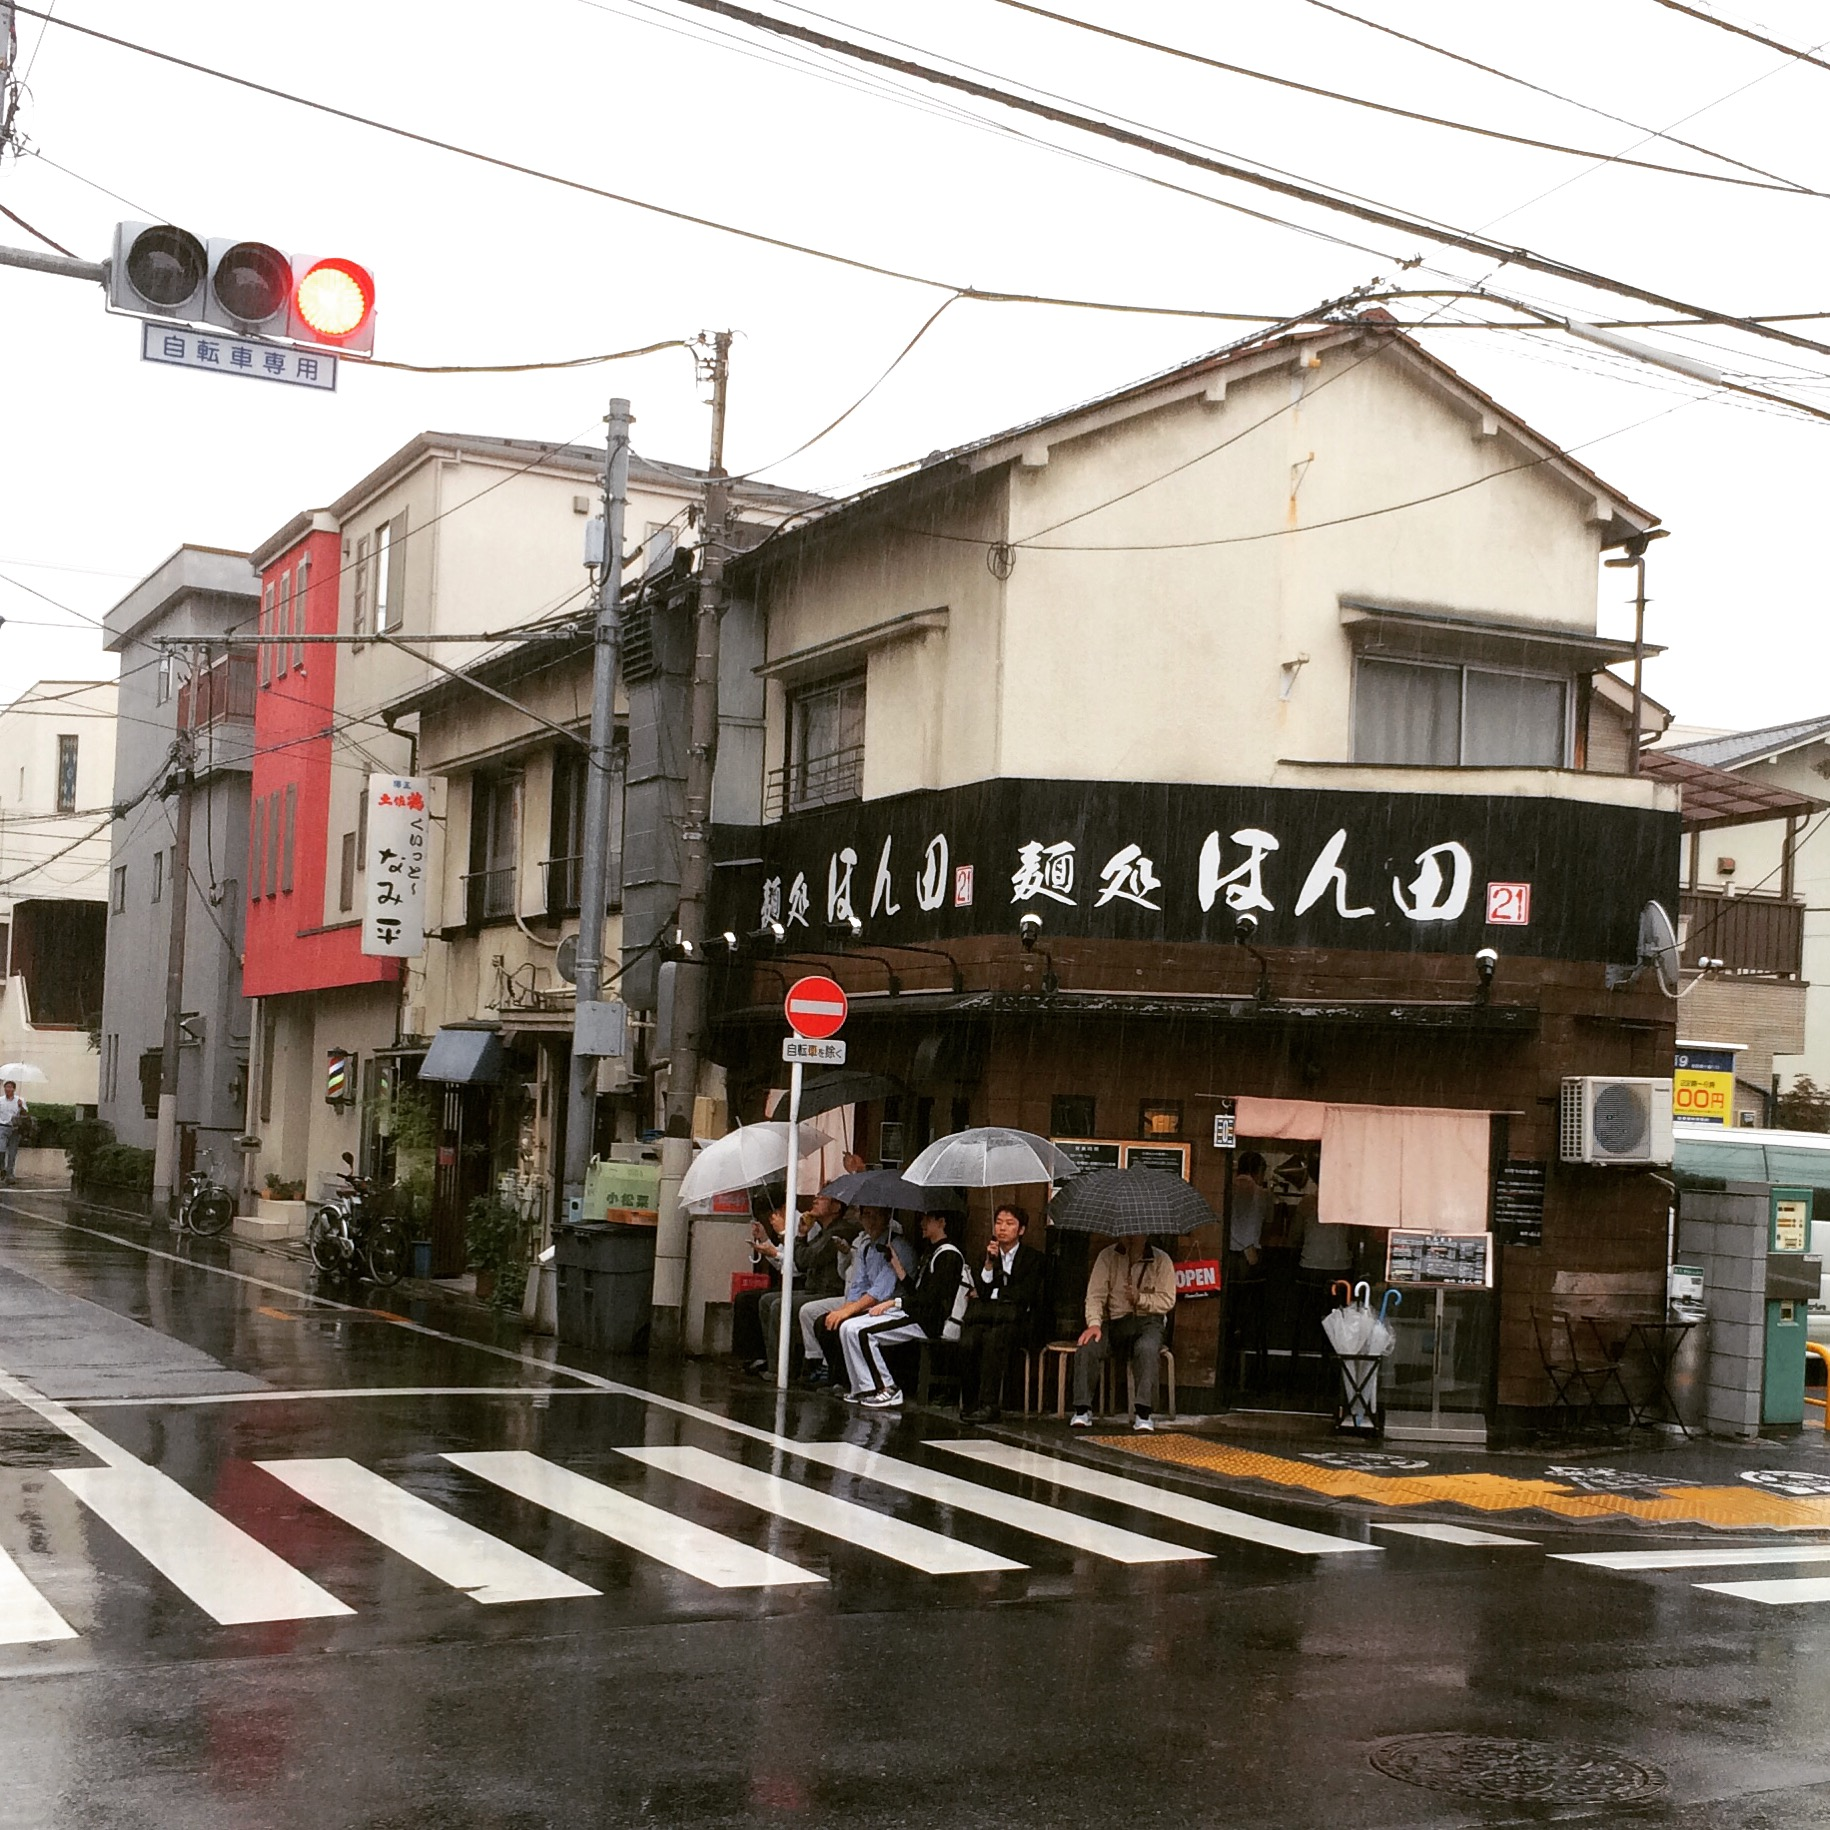 Mendokoro Honda Shop - Abram color.jpg